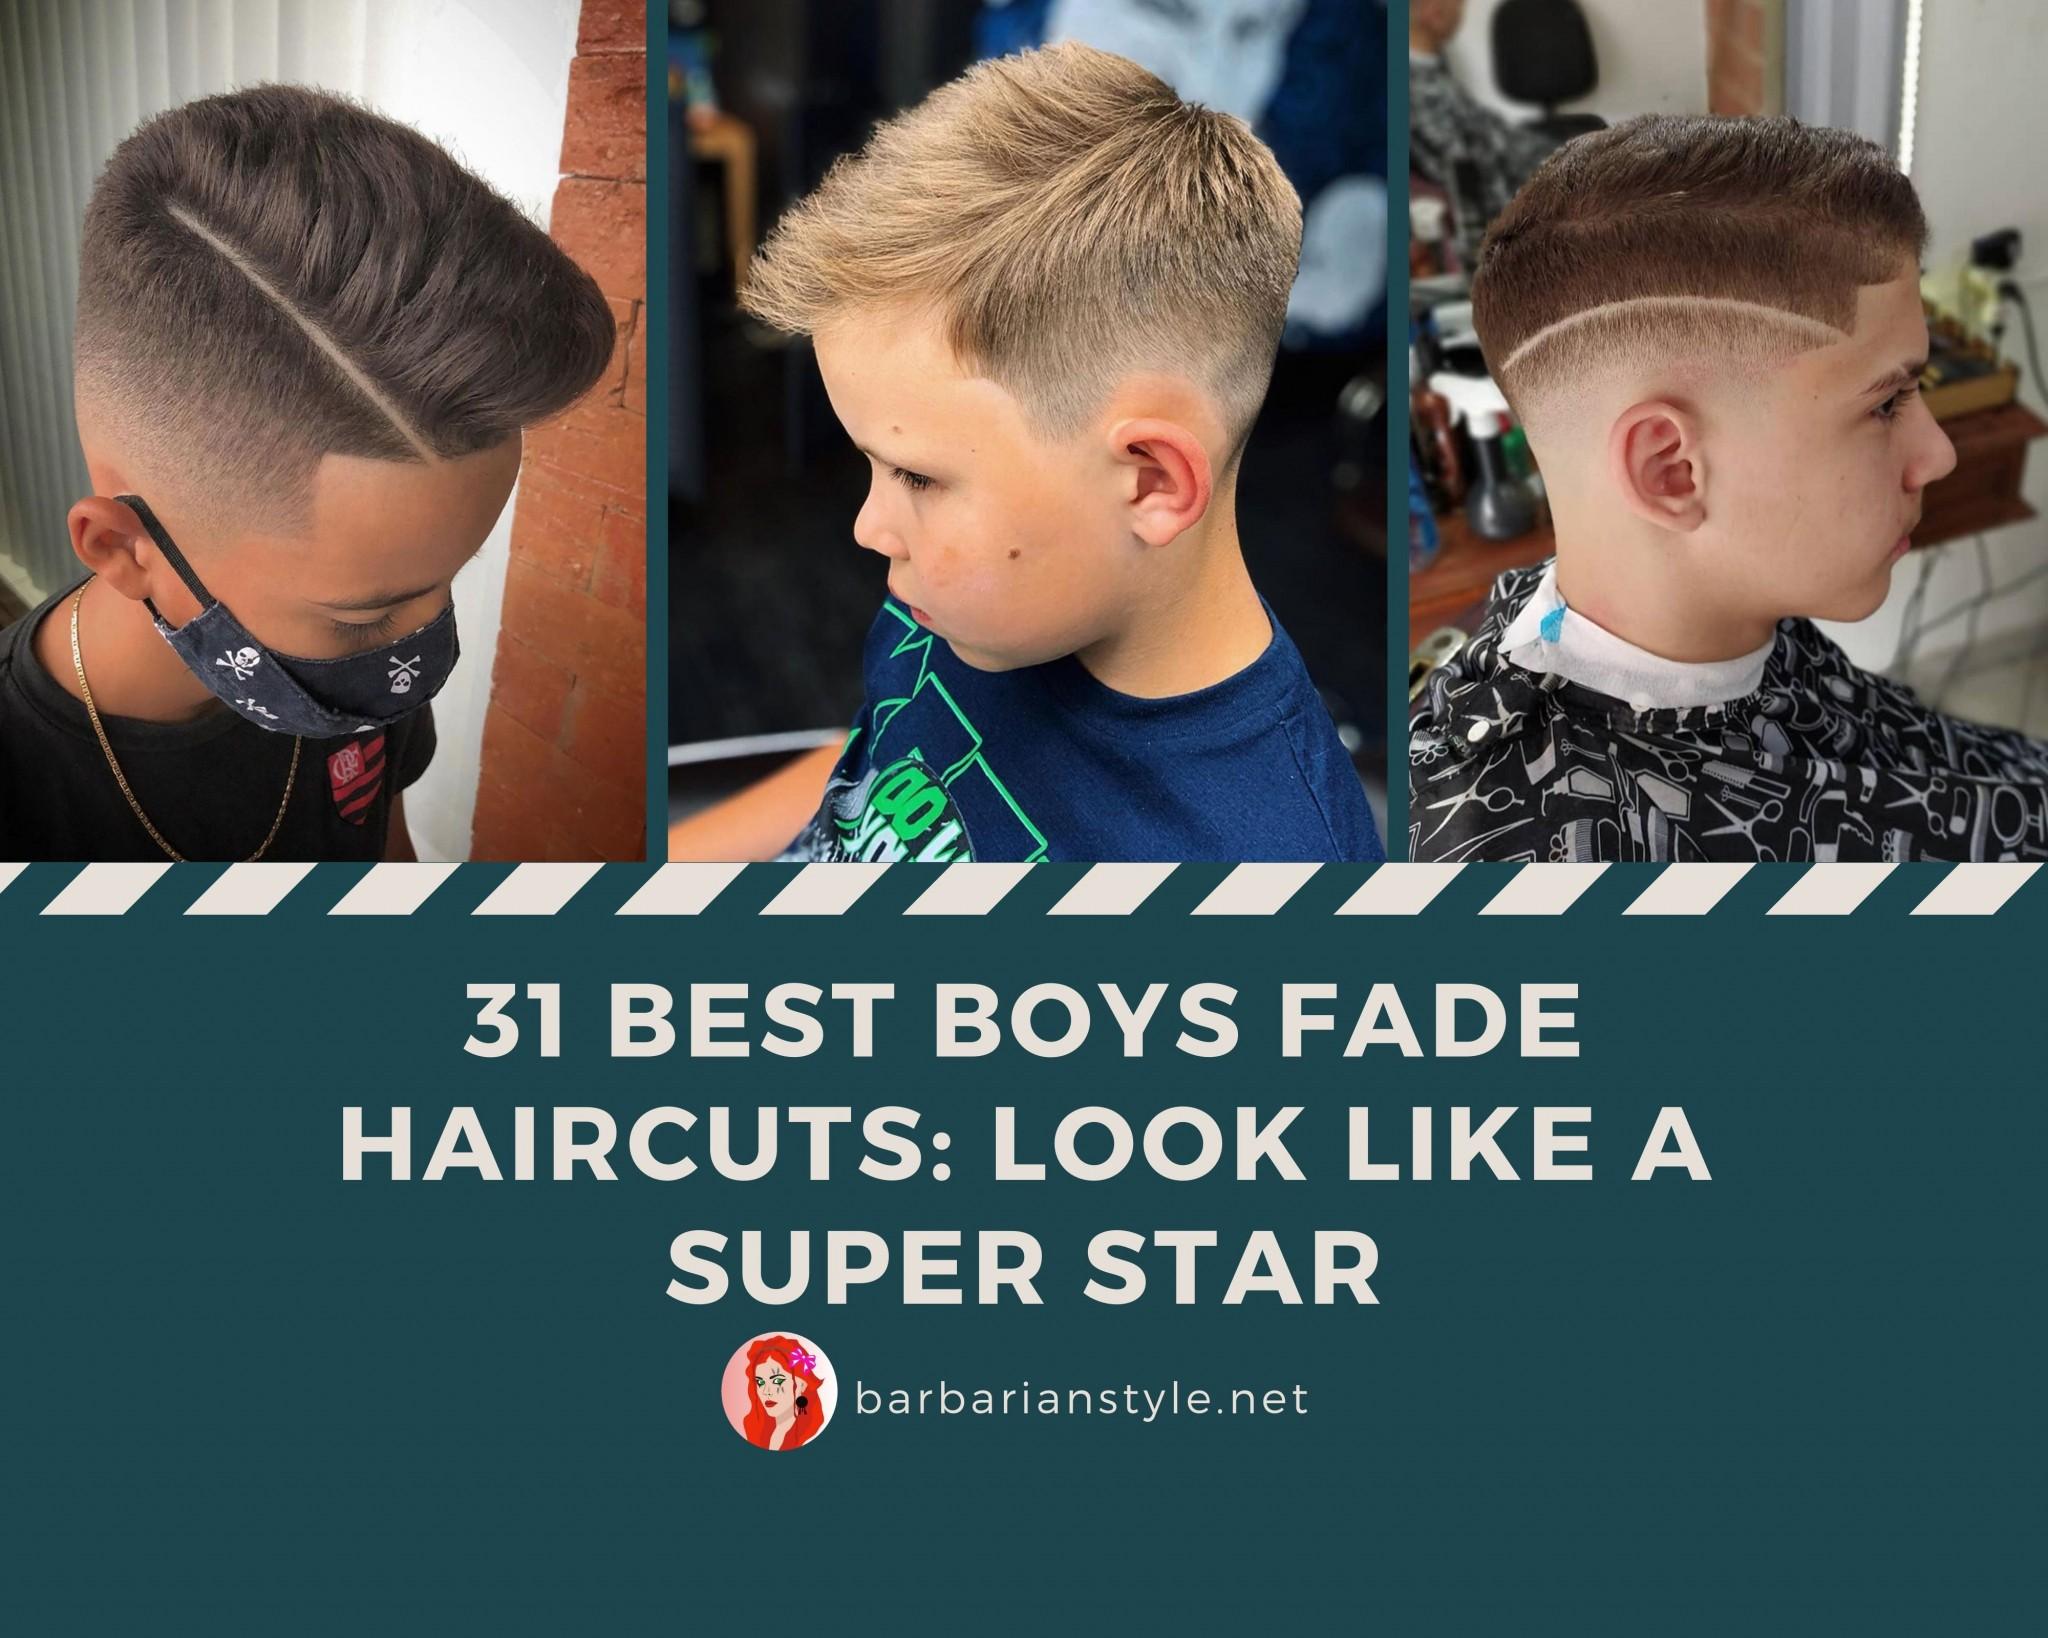 31 Best Boys Fade Haircuts Look Like A Super Star